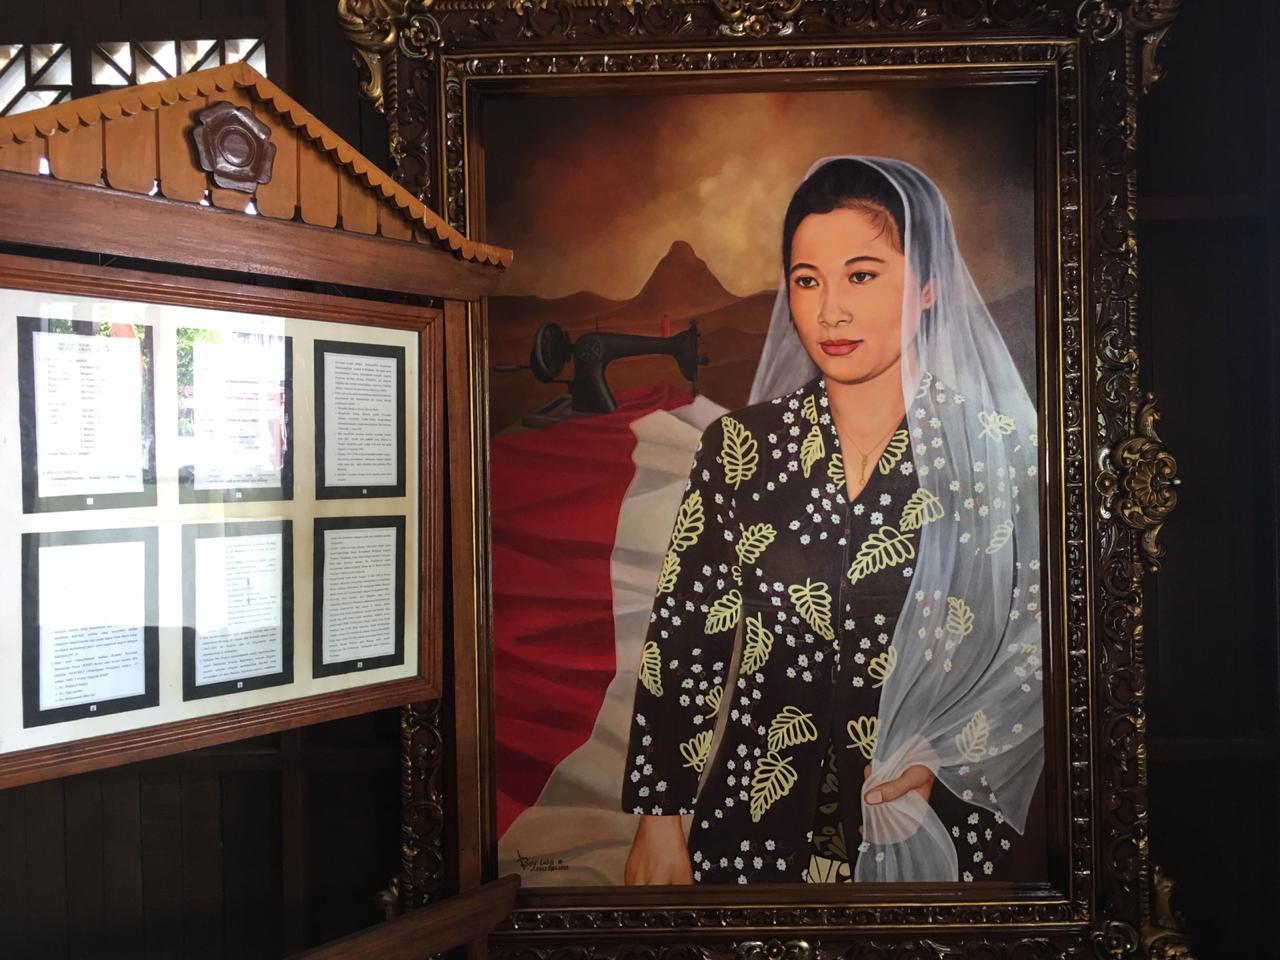 https: img.okezone.com content 2021 03 30 337 2386233 kisah-tulisan-terakhir-fatmawati-tjintamu-menjiwai-rakyat-tjinta-fat-saat-bung-karno-meninggal-07AnBkxSO7.jpg